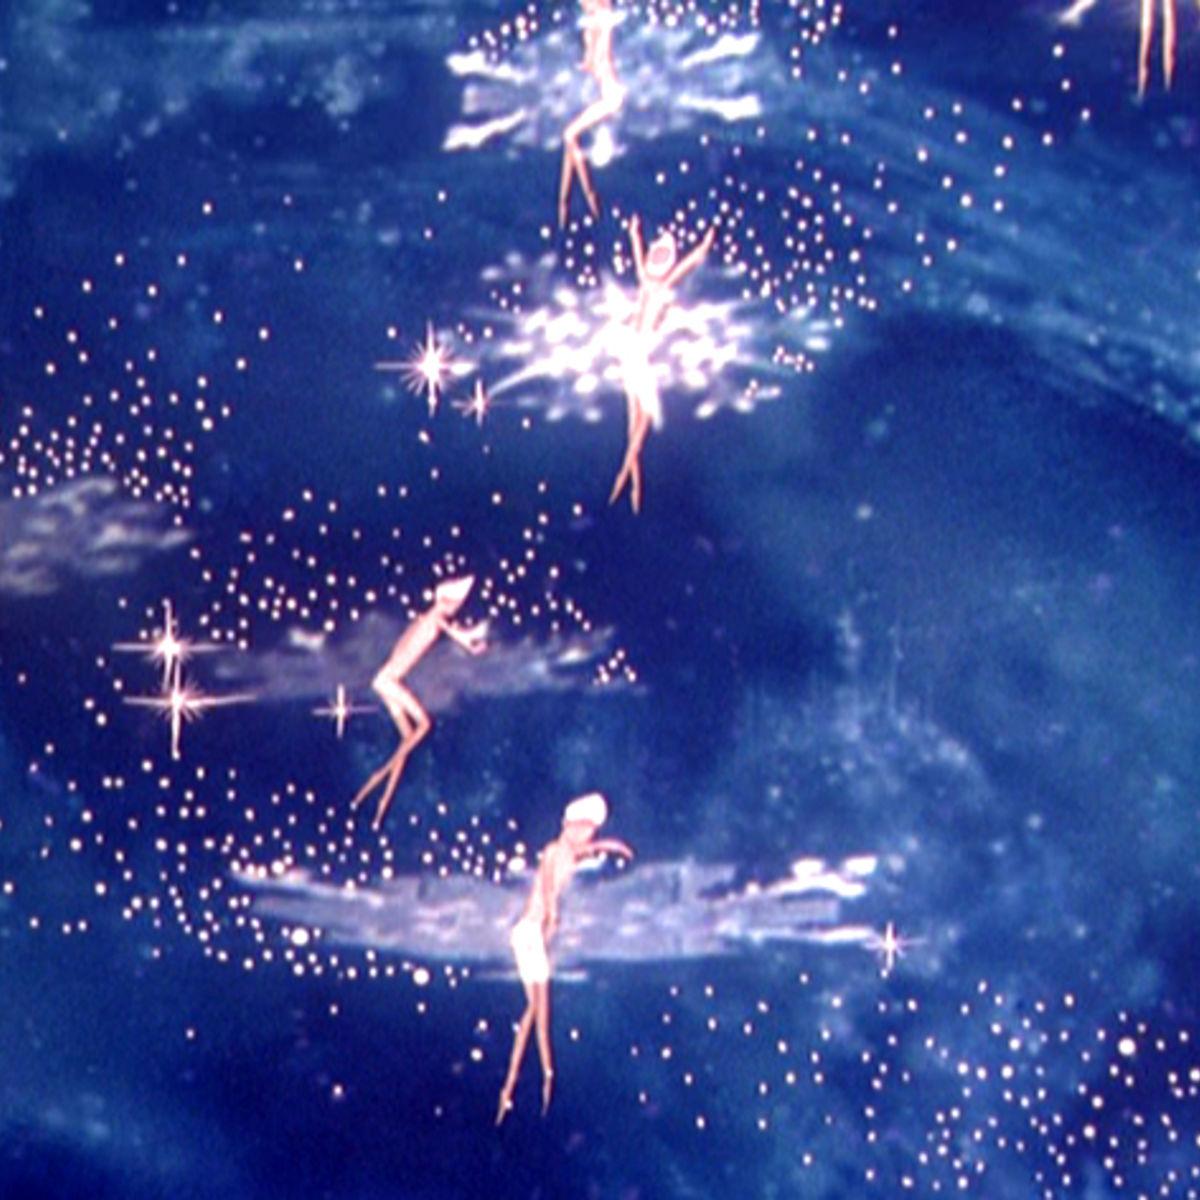 fantasia-winter-fairies.jpg